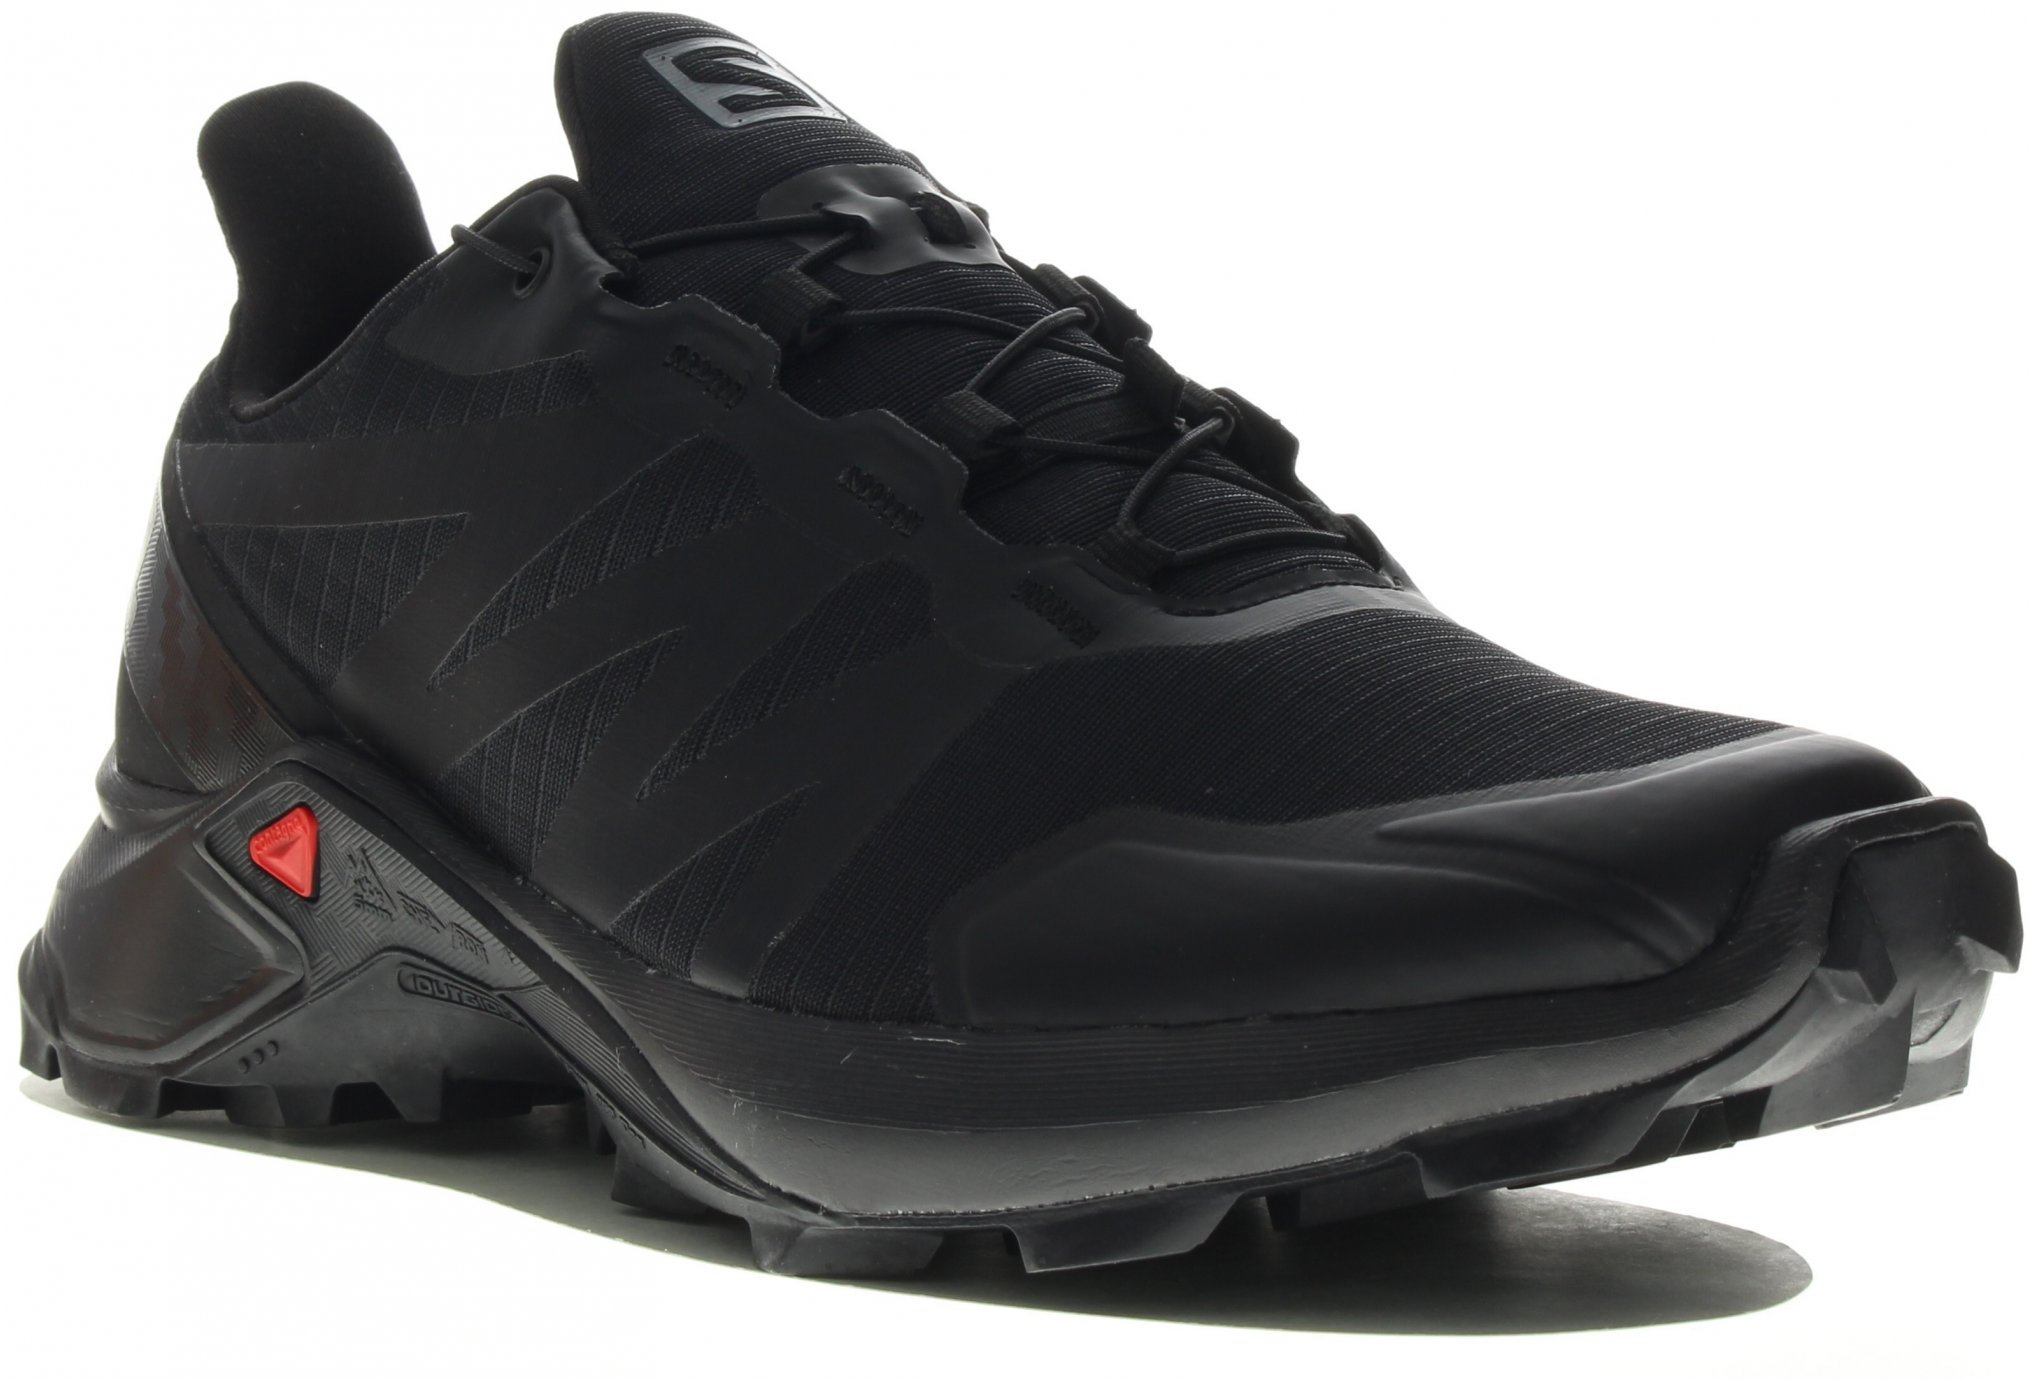 Salomon Supercross Chaussures running femme